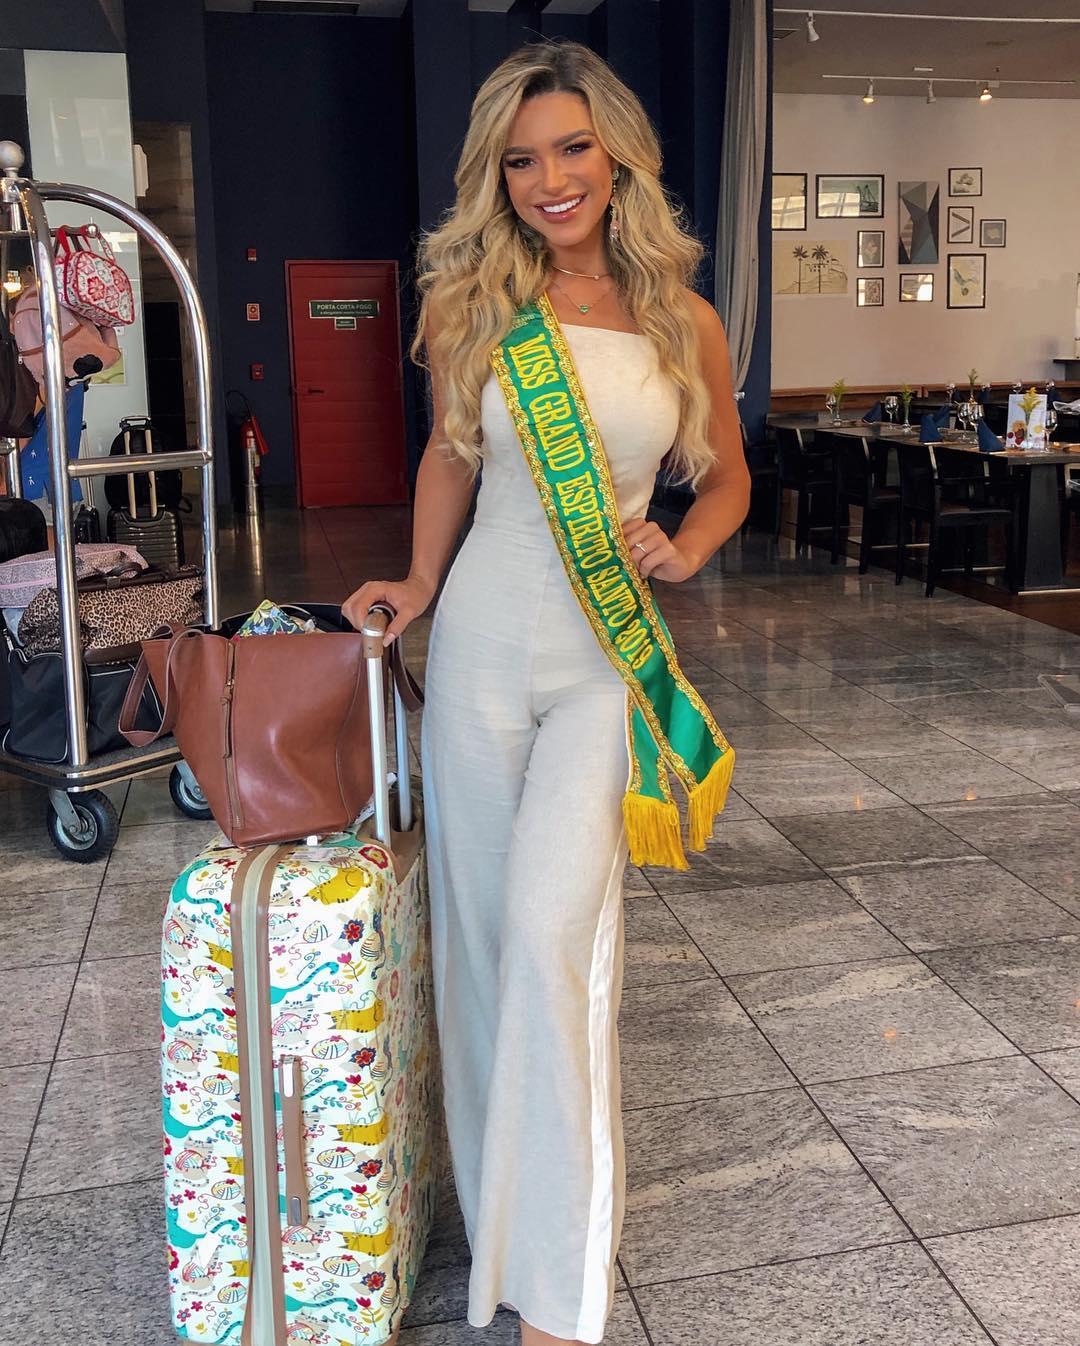 amanda cardoso, miss grand espirito santo 2019/3rd runner-up de miss intercontinental 2017. - Página 13 51796711